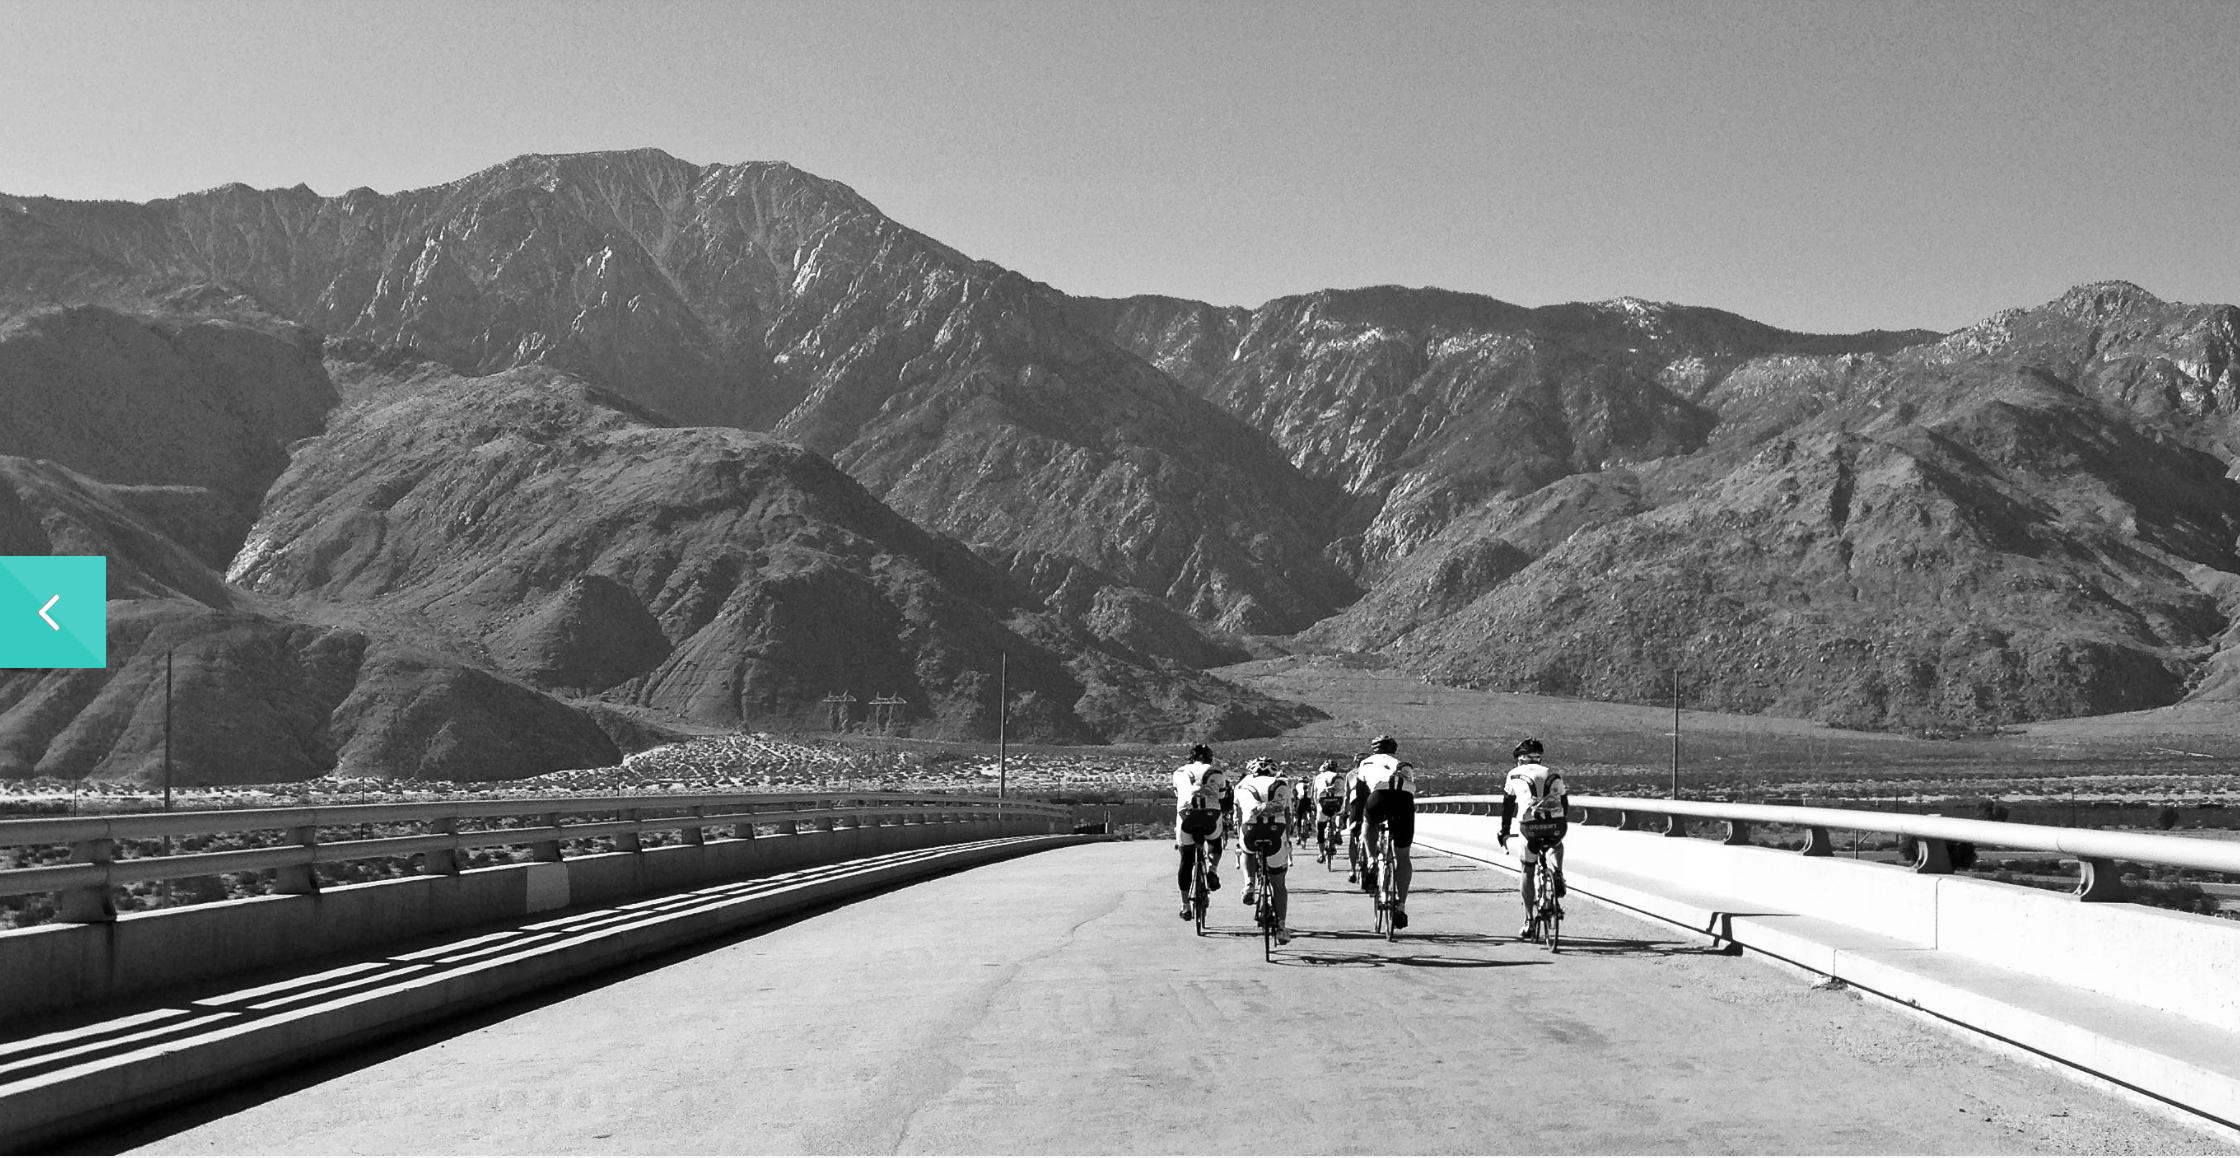 Desert_Cycling.png